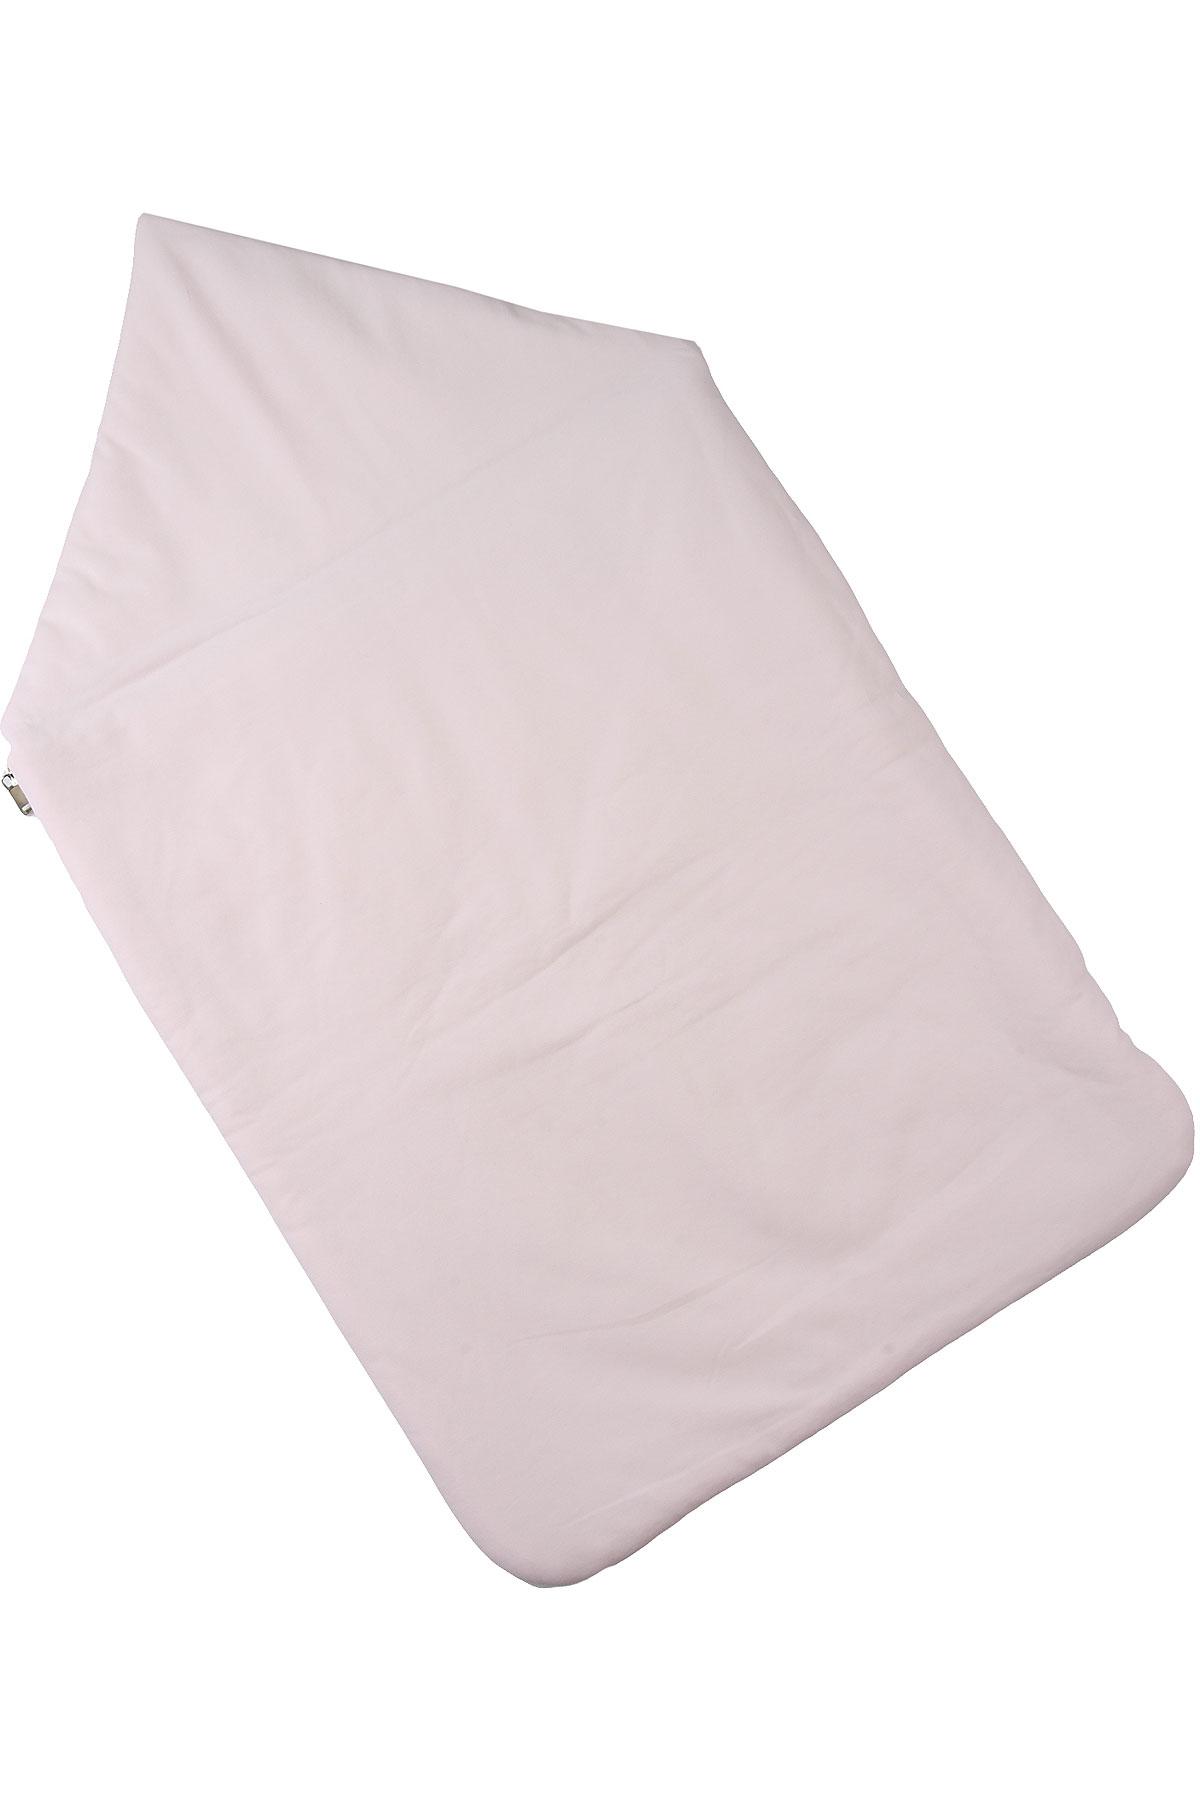 Roberto Cavalli Baby Bodysuits & Onesies for Girls On Sale, pin, Cotton, 2019